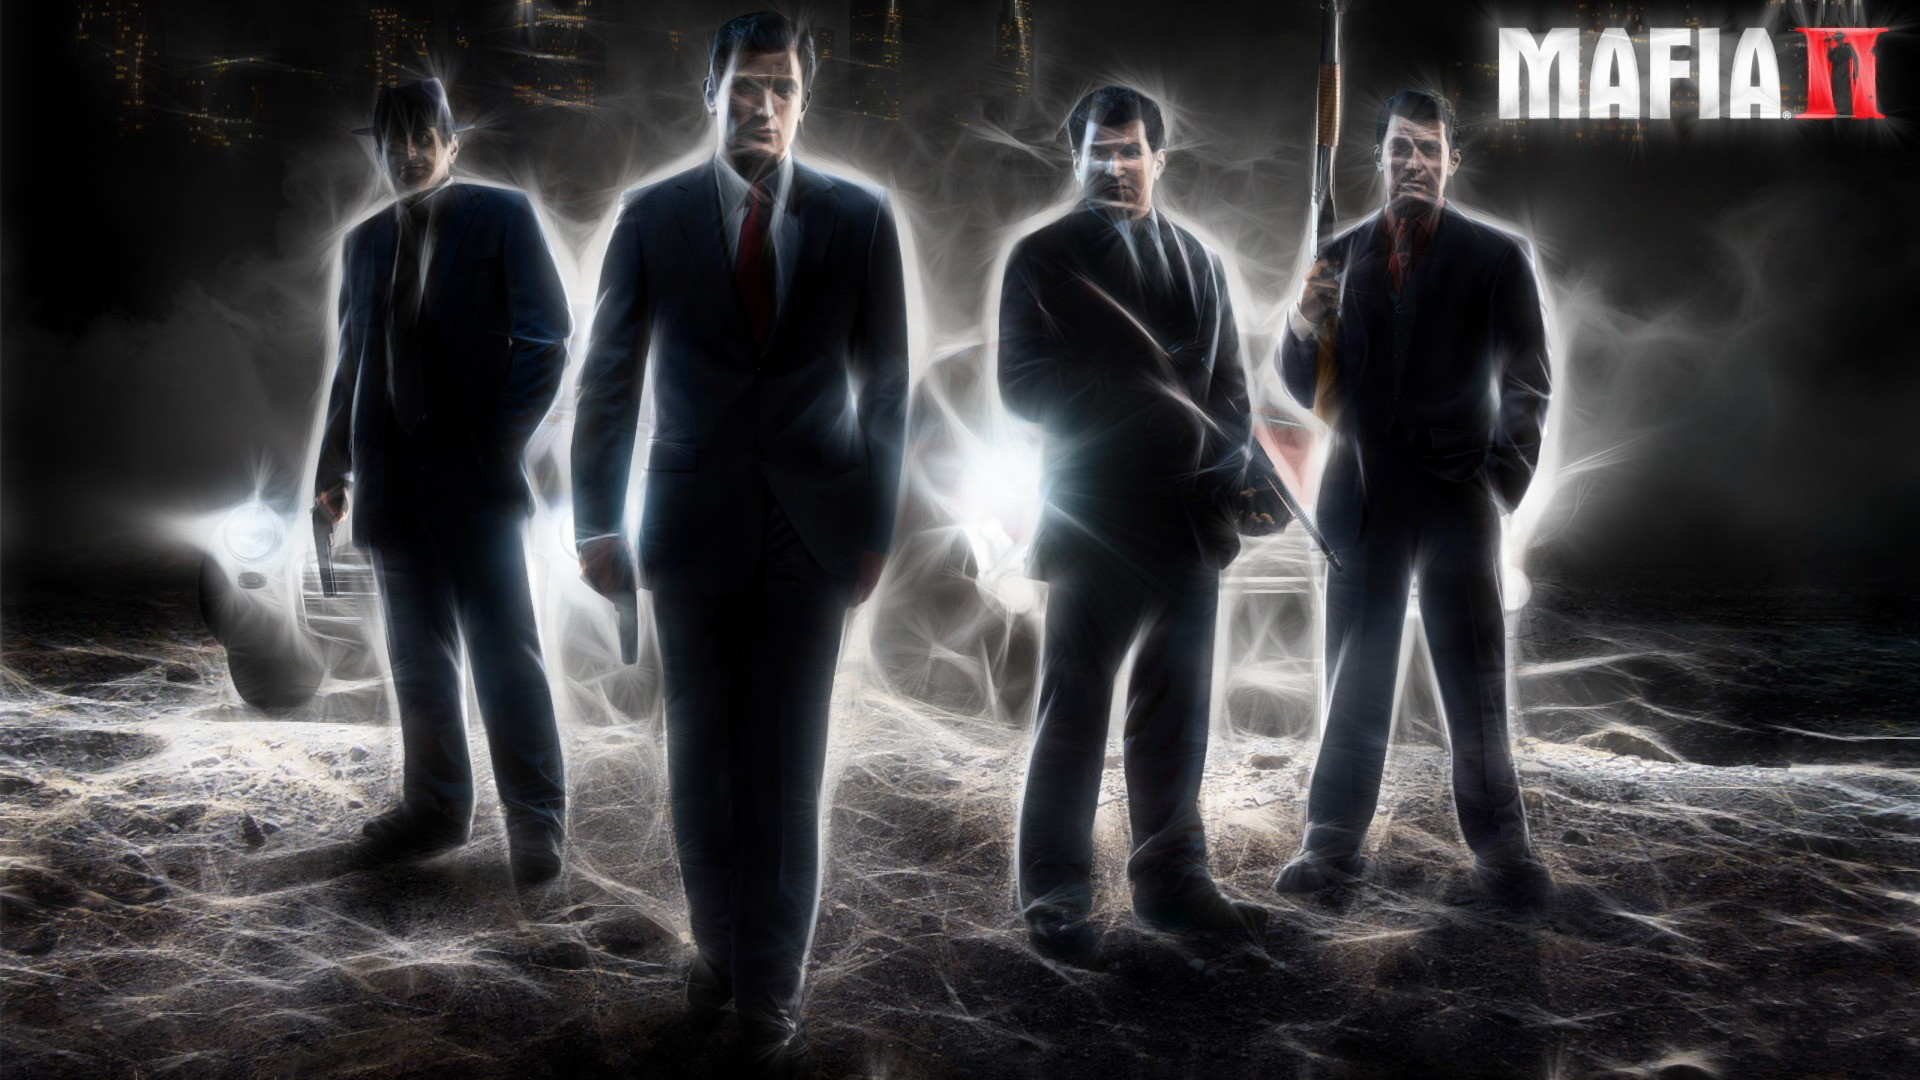 Mafia II wallpaper – 296371